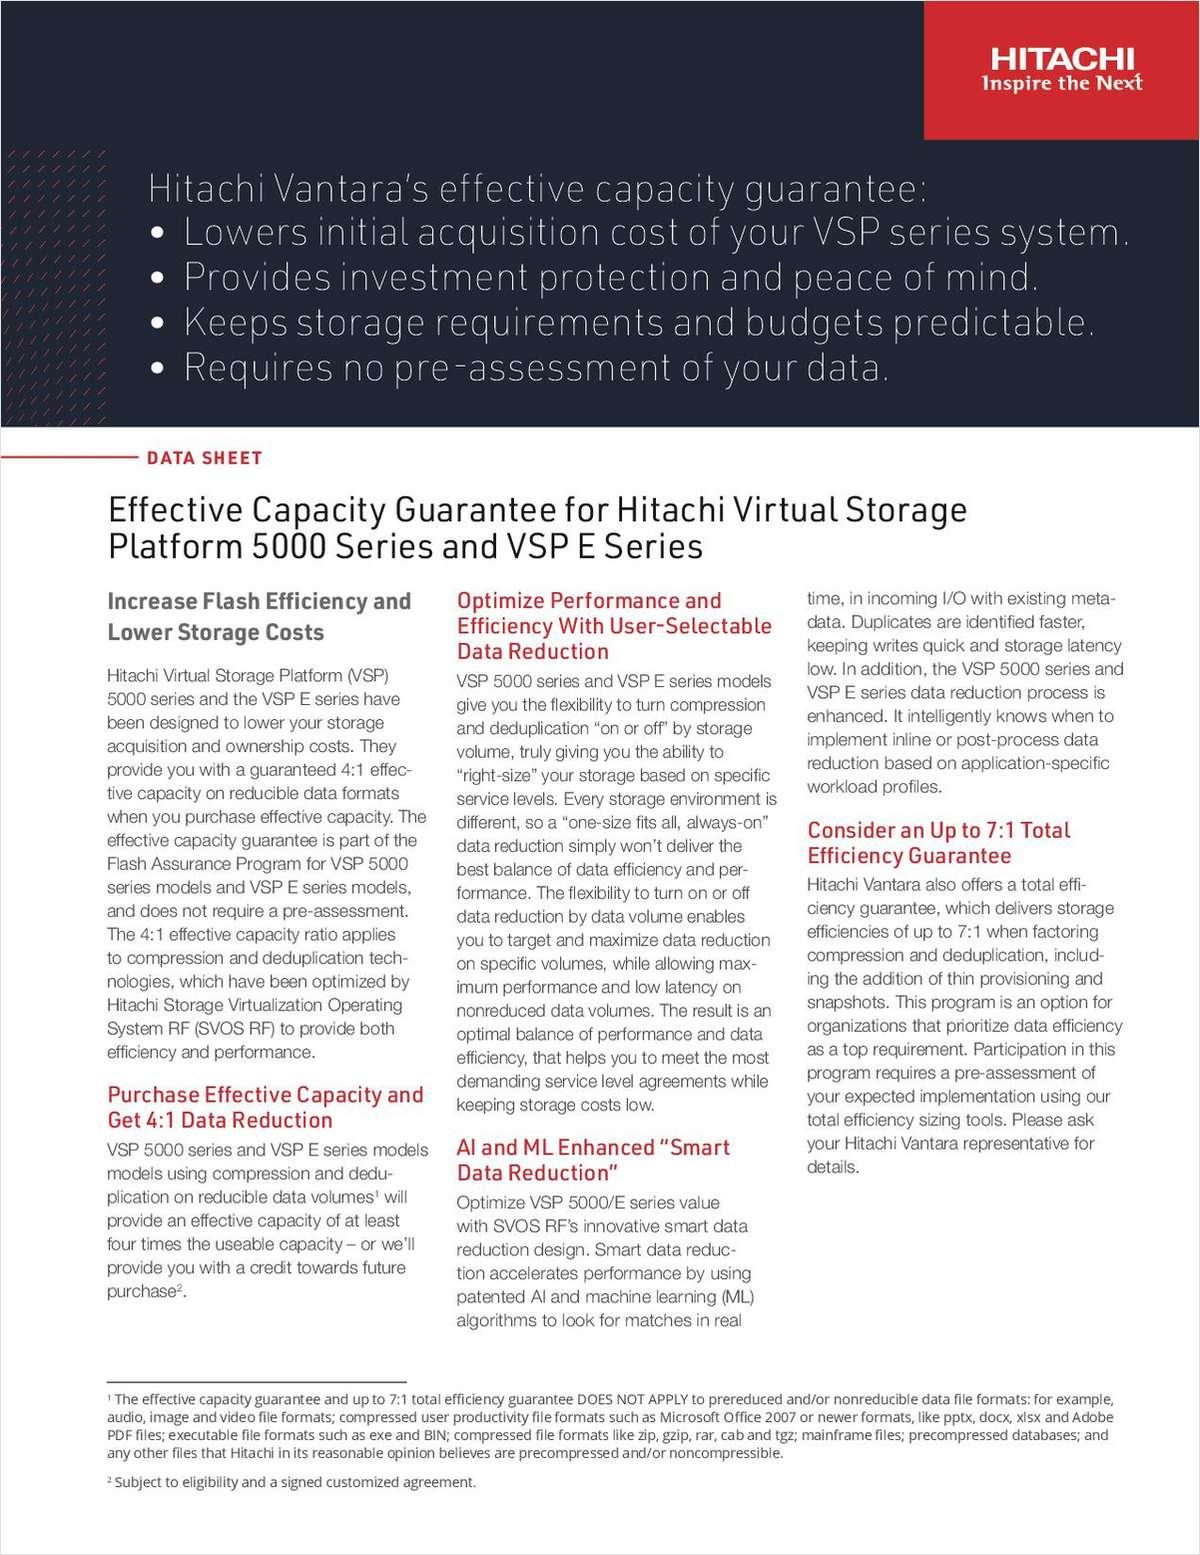 Effective Capacity Guarantee for VSP 5000 Series e990